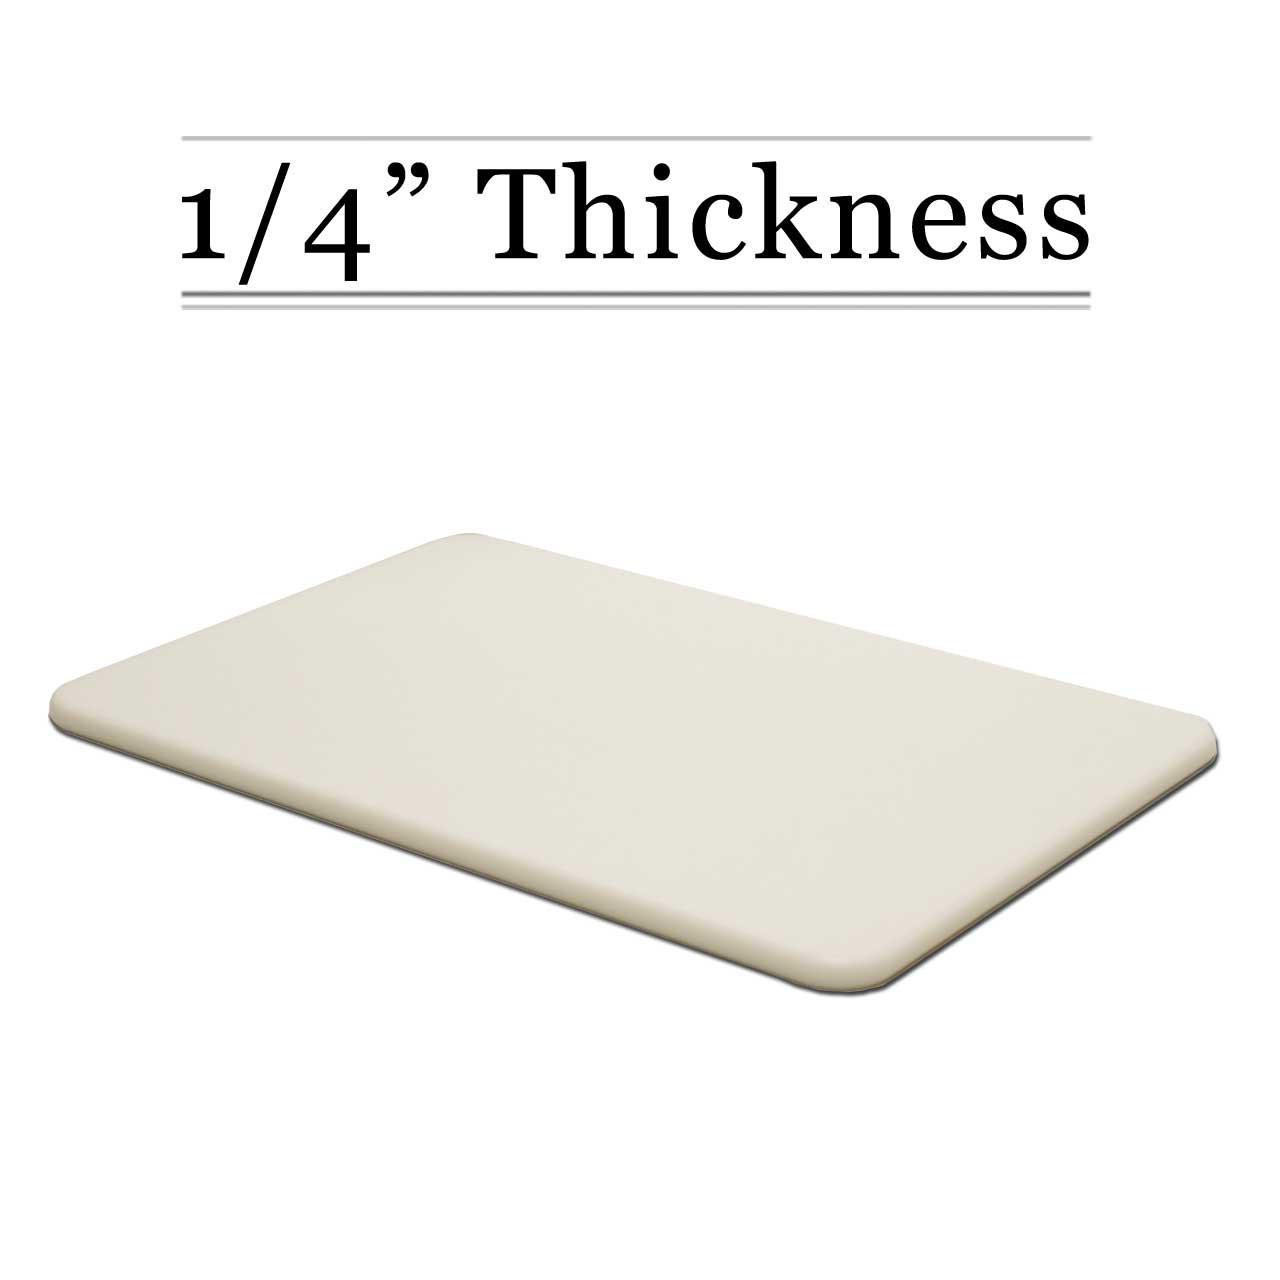 1 4 Thick White Custom Cutting Board